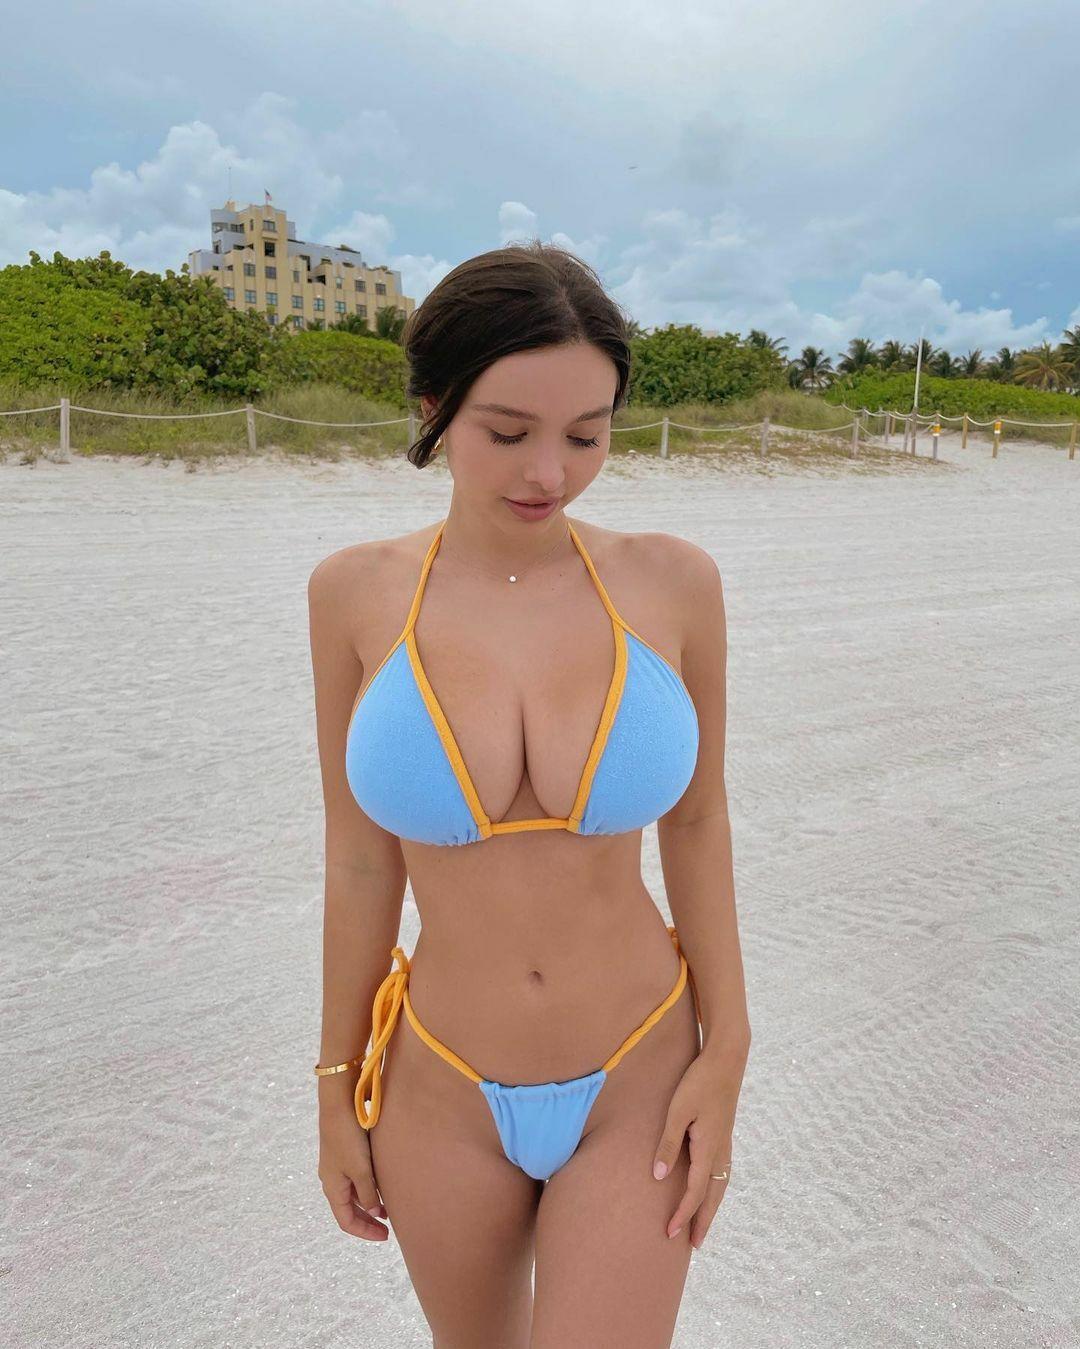 Sophie Mudd Gorgeous Boobs In Bikini